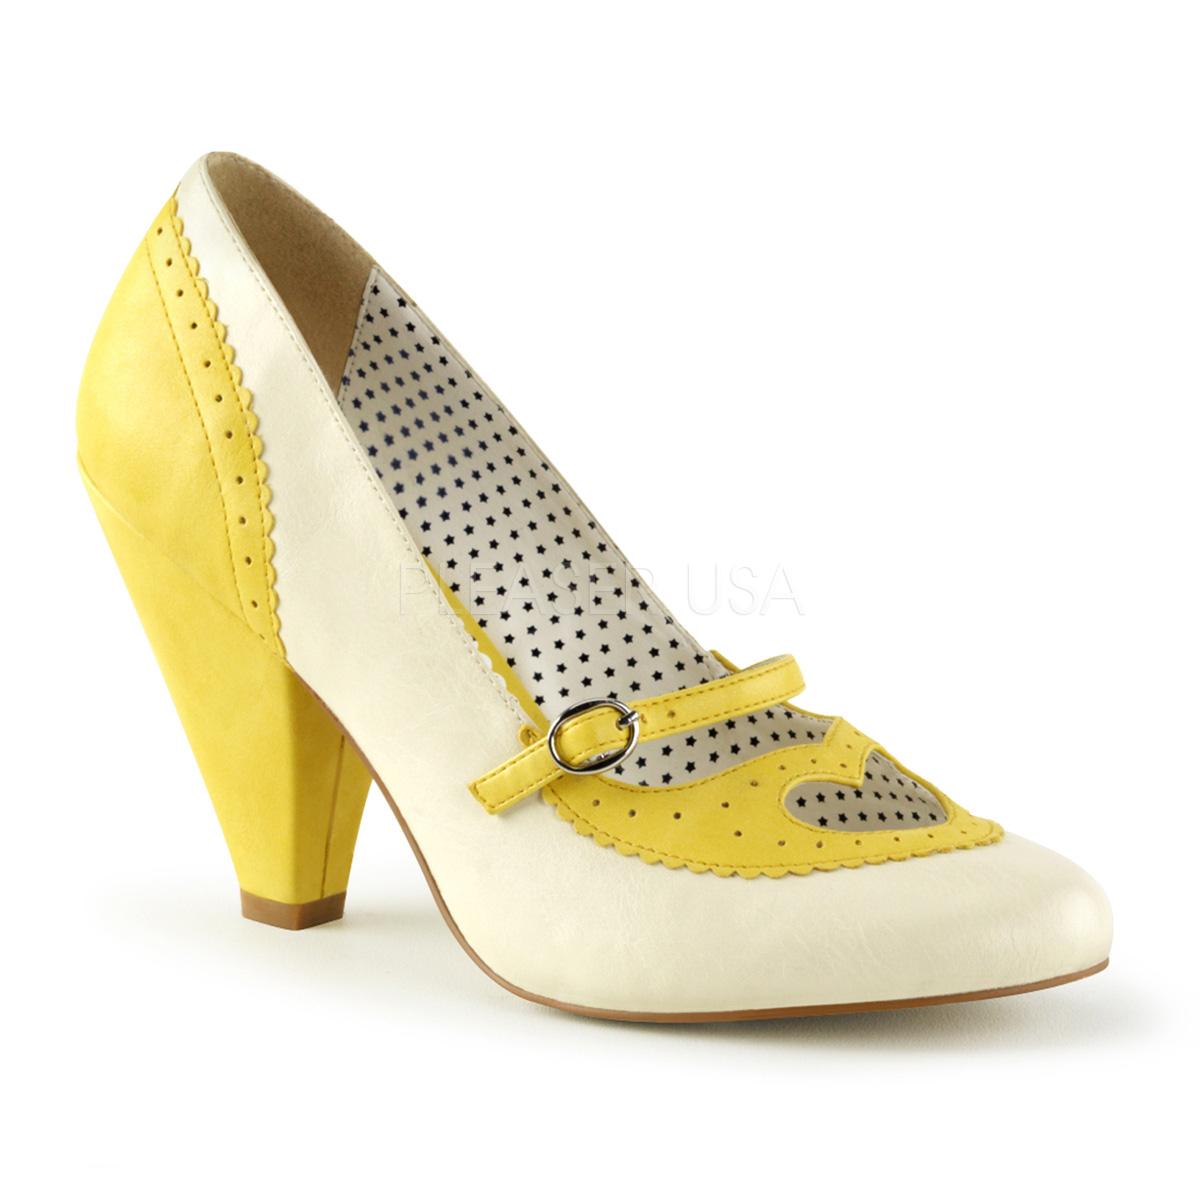 Pin Up Couture POPPY-18 Femme TeKMCn6s3L